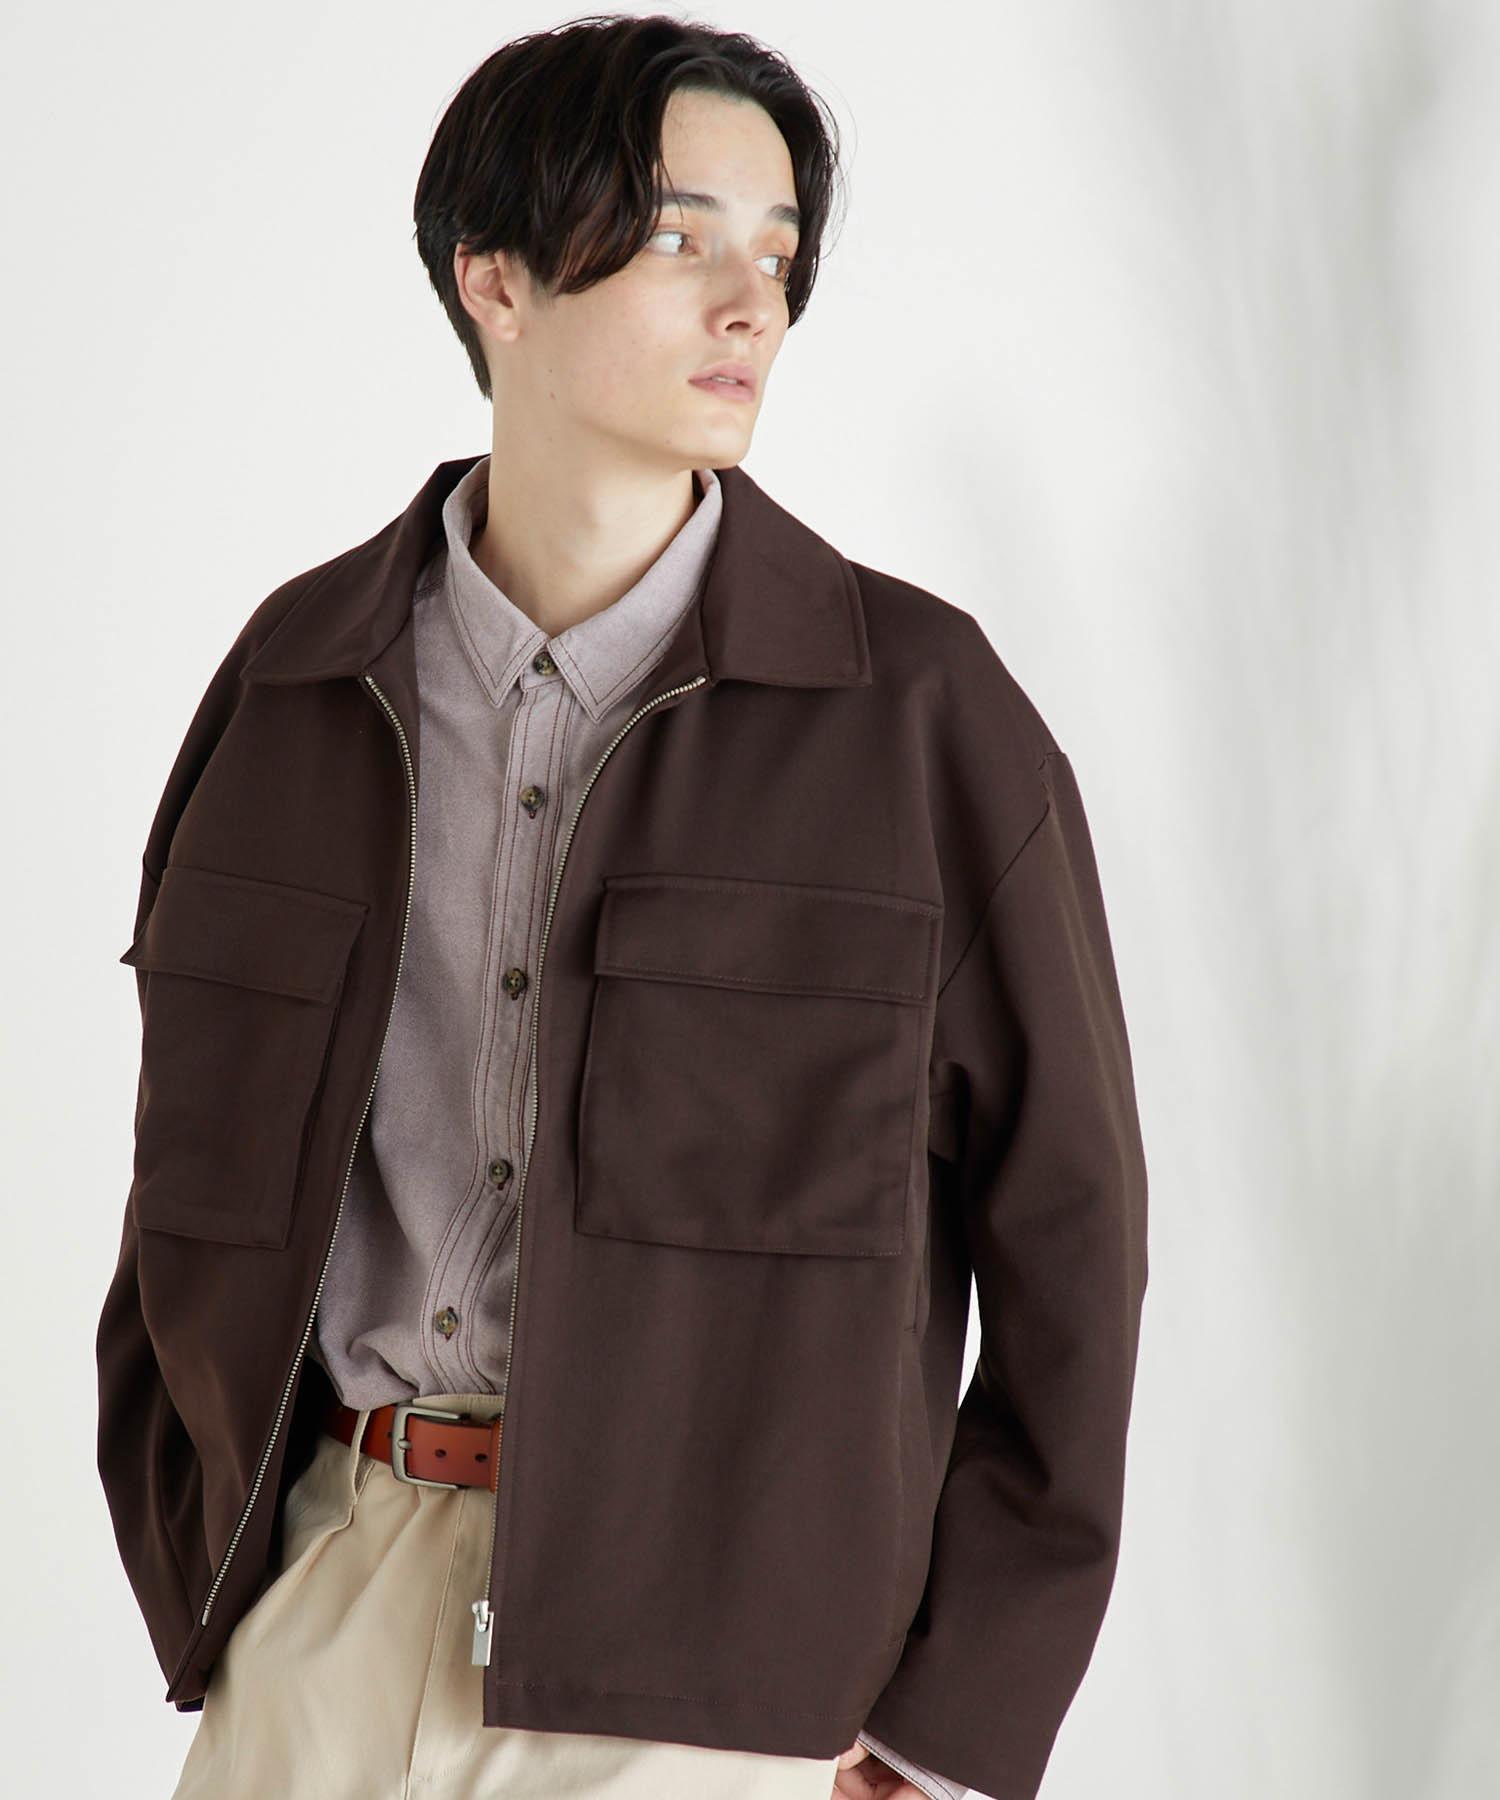 TRストレッチ スーツ地 オーバーサイズ CPOジャケット/セットアップ可